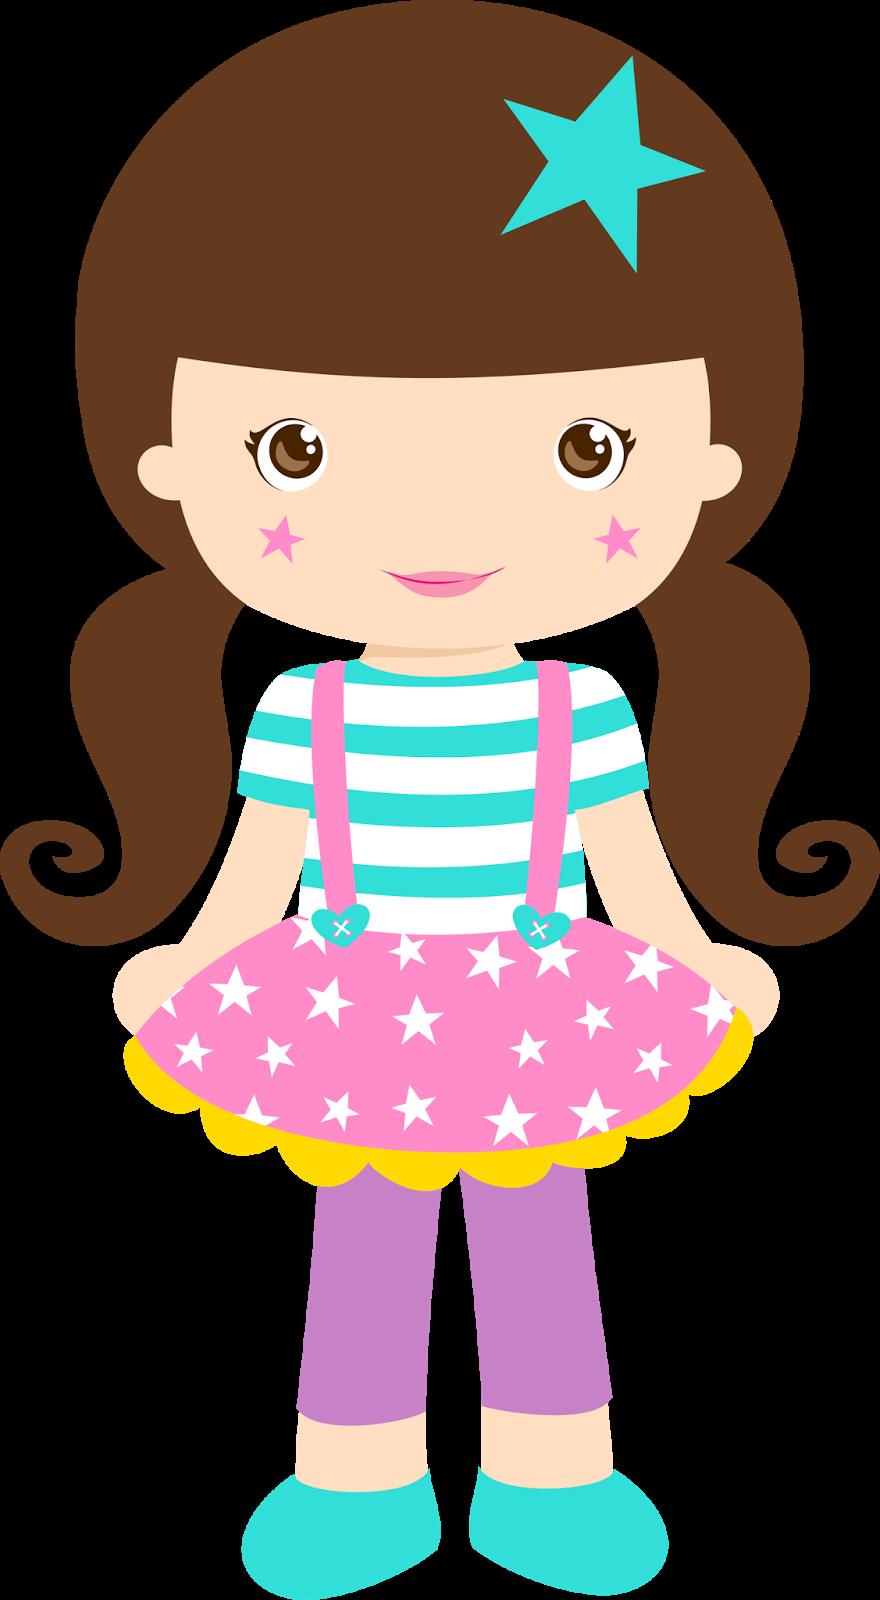 Cute little house clipart image black and white stock fondos dibujos circo - Buscar con Google | cute little girls ... image black and white stock